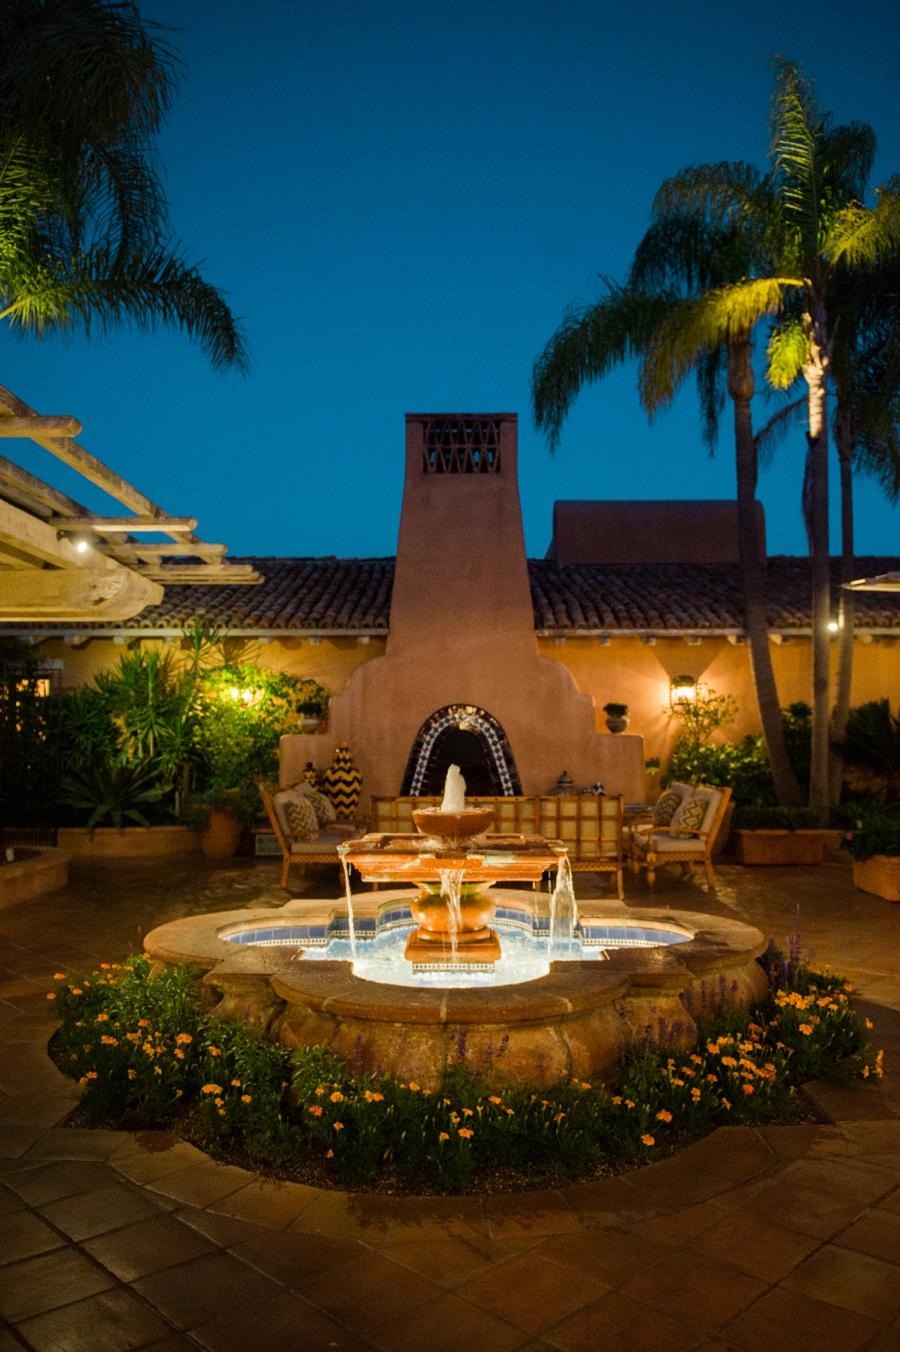 Rancho_Valencia_Resort_and_Spa_San_Diego_SoCal_Wedding_032.jpg